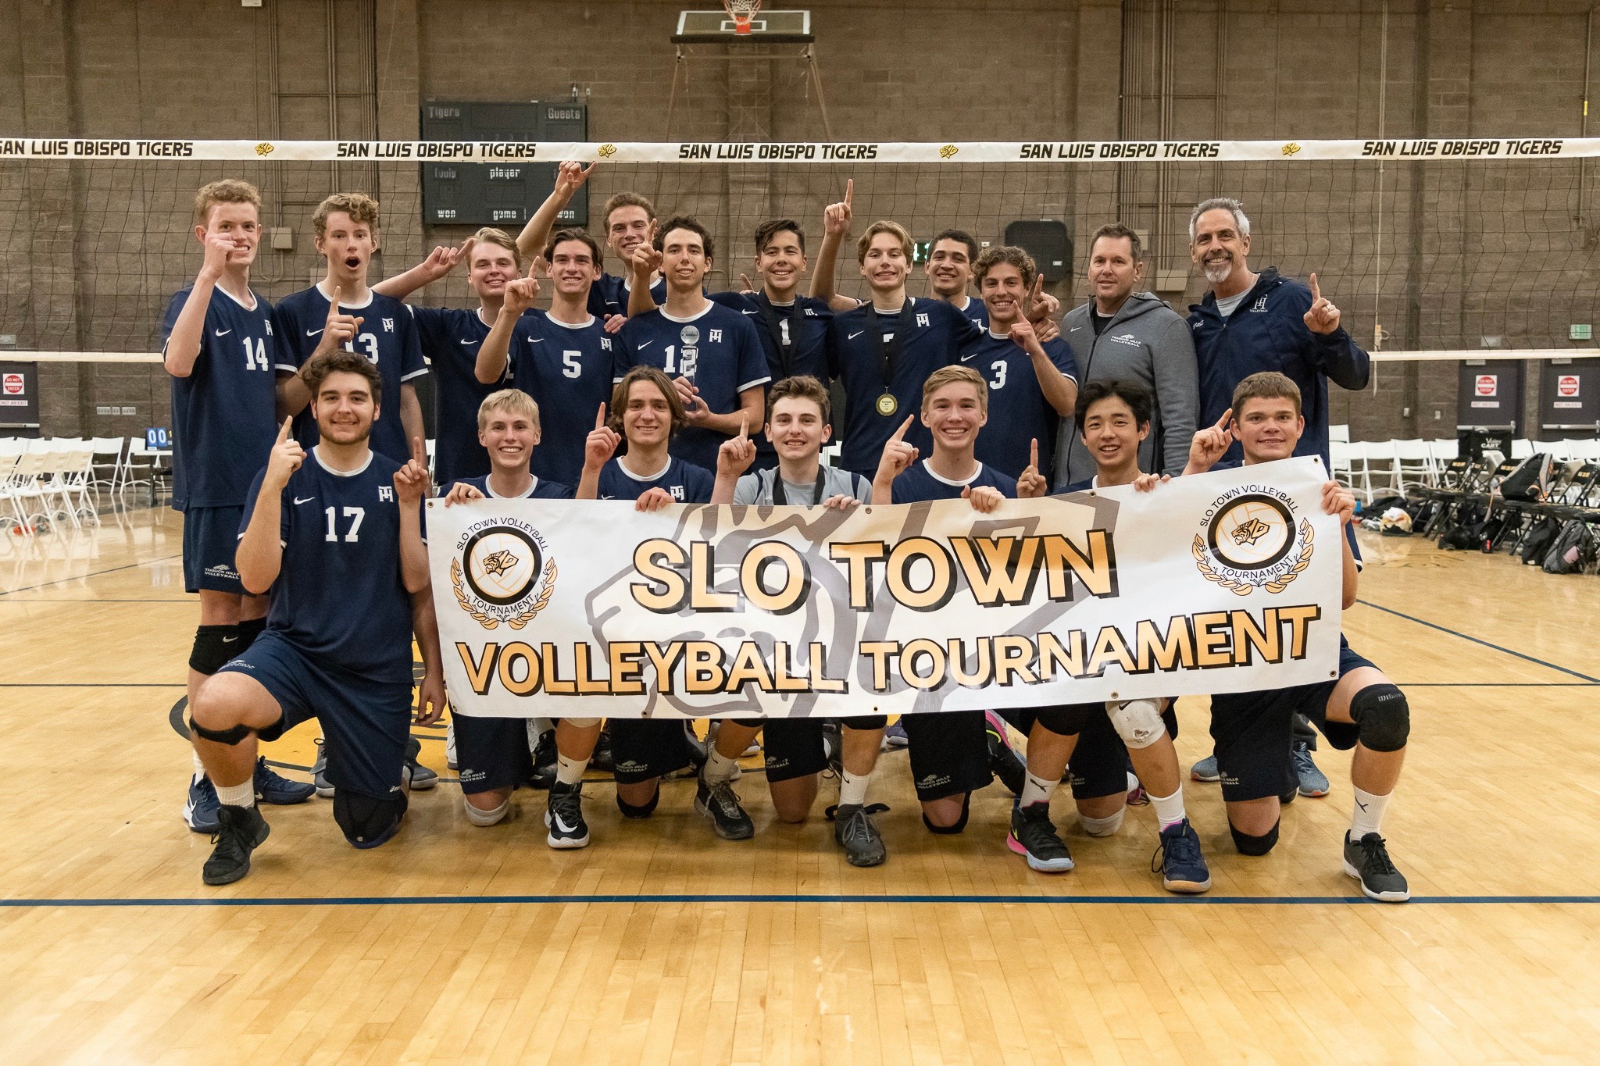 Boys Volleyball Wins San Luis Obispo Tournament!